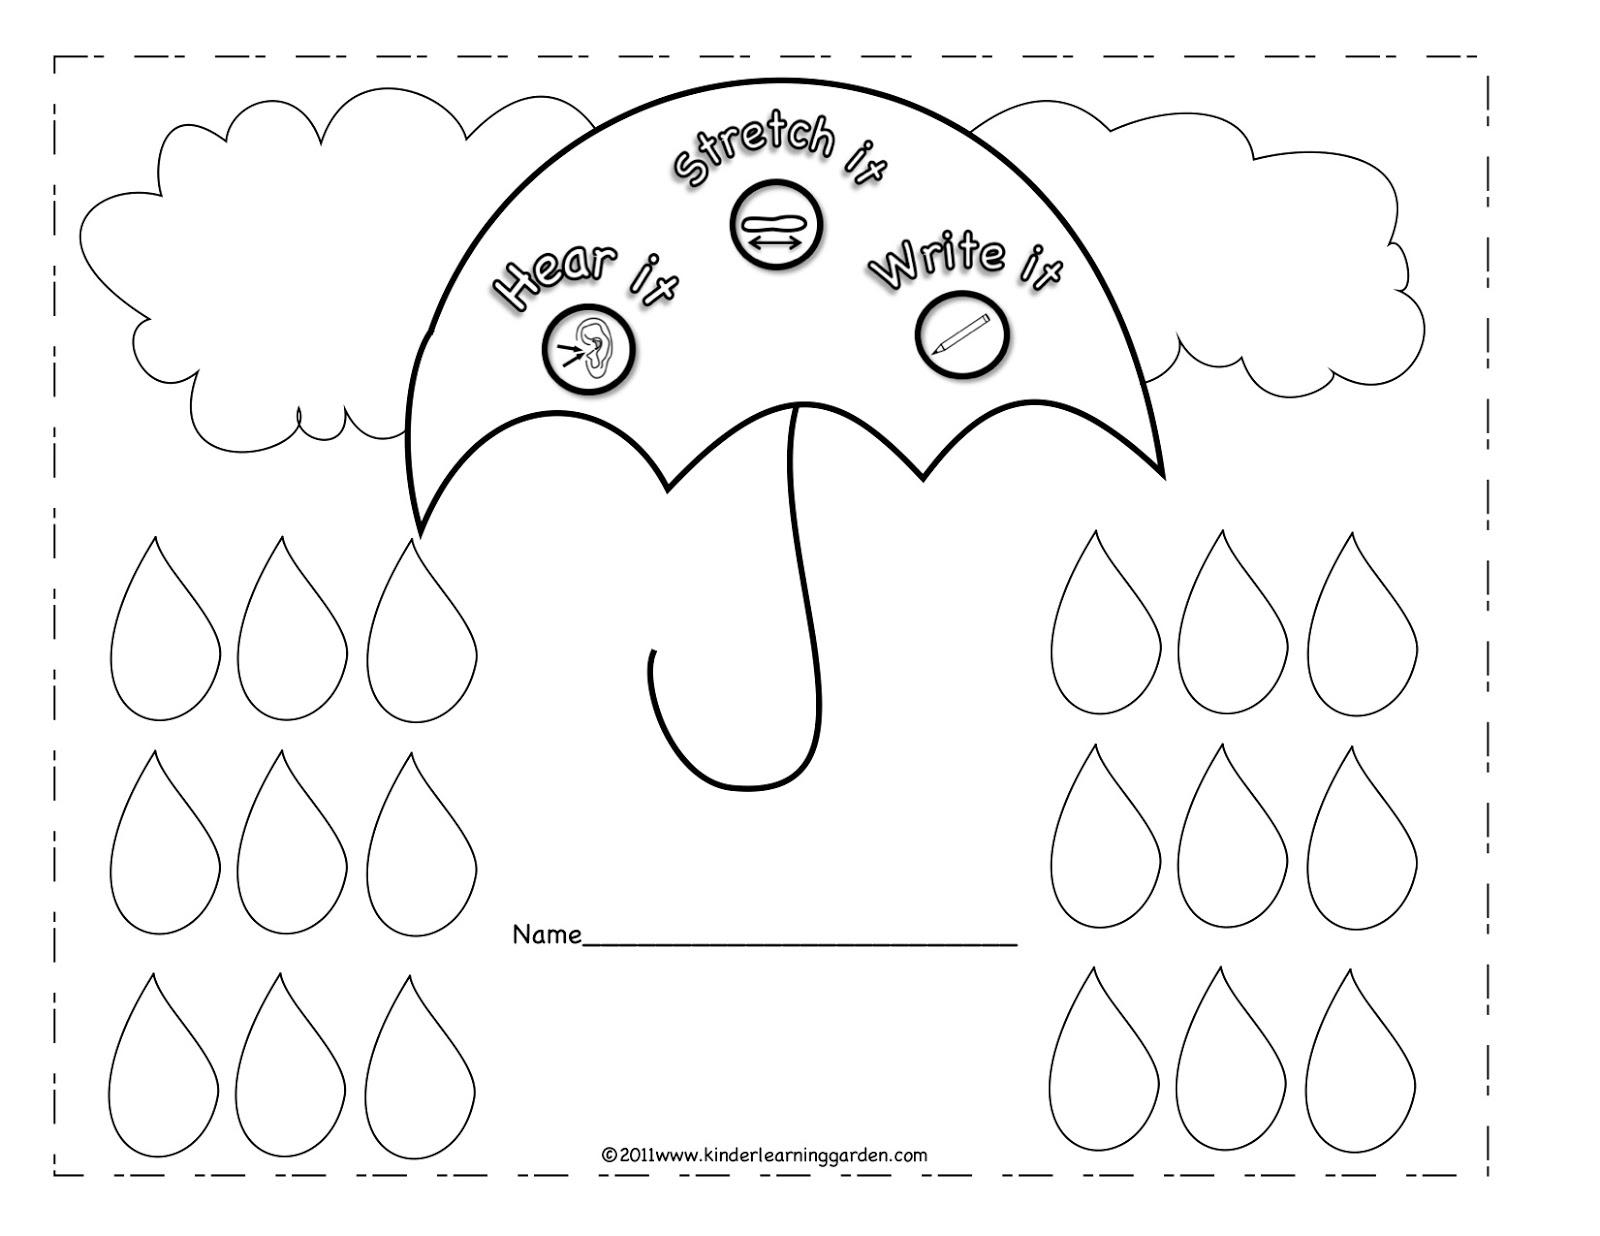 April Coloring Pages Preschool : Kinder learning garden april freebies